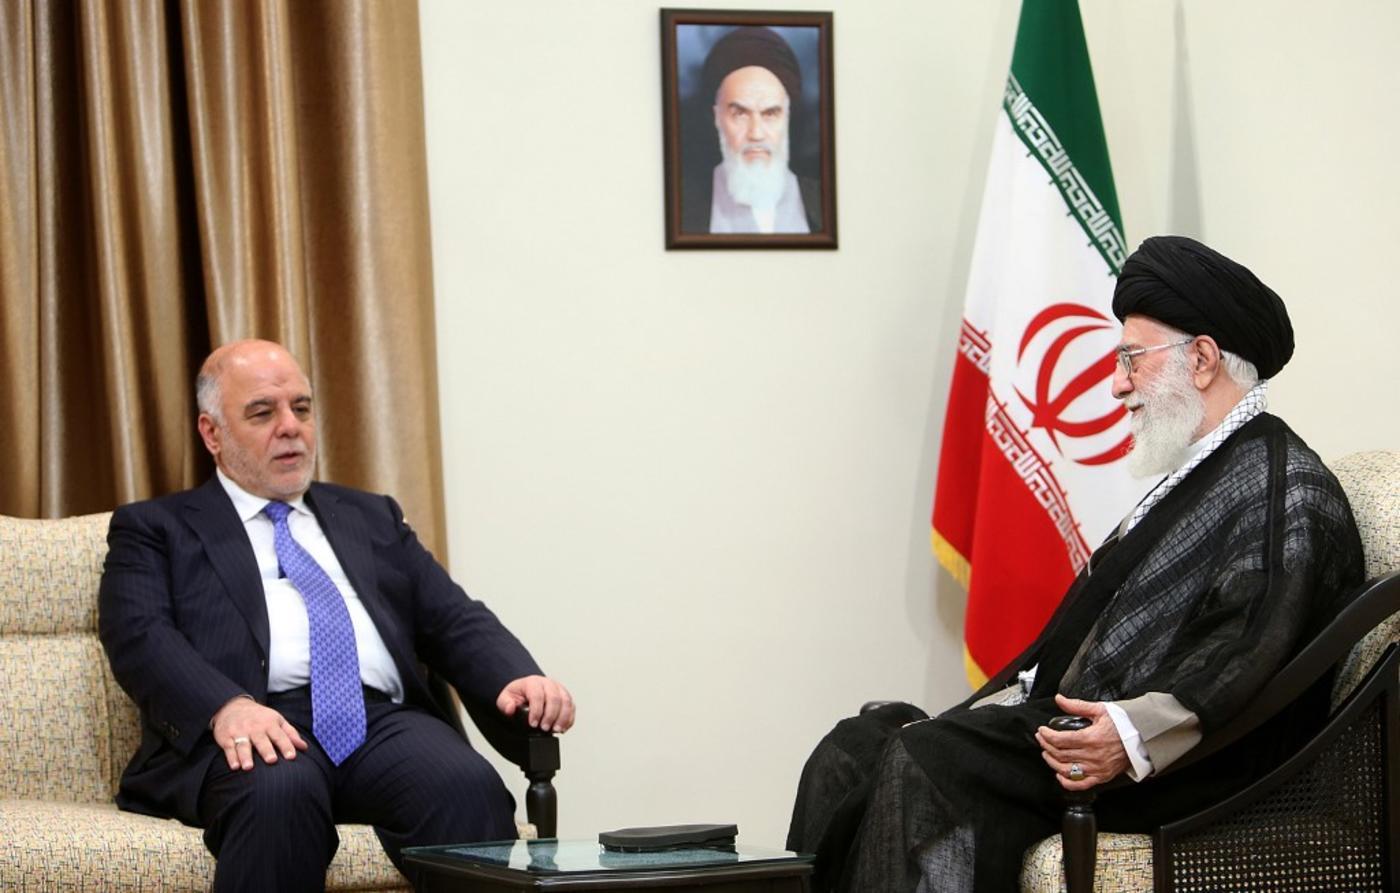 Haider al-Abadi meets Iranian Supreme Leader Ali Khamenei in Tehran in 2015 (AFP)